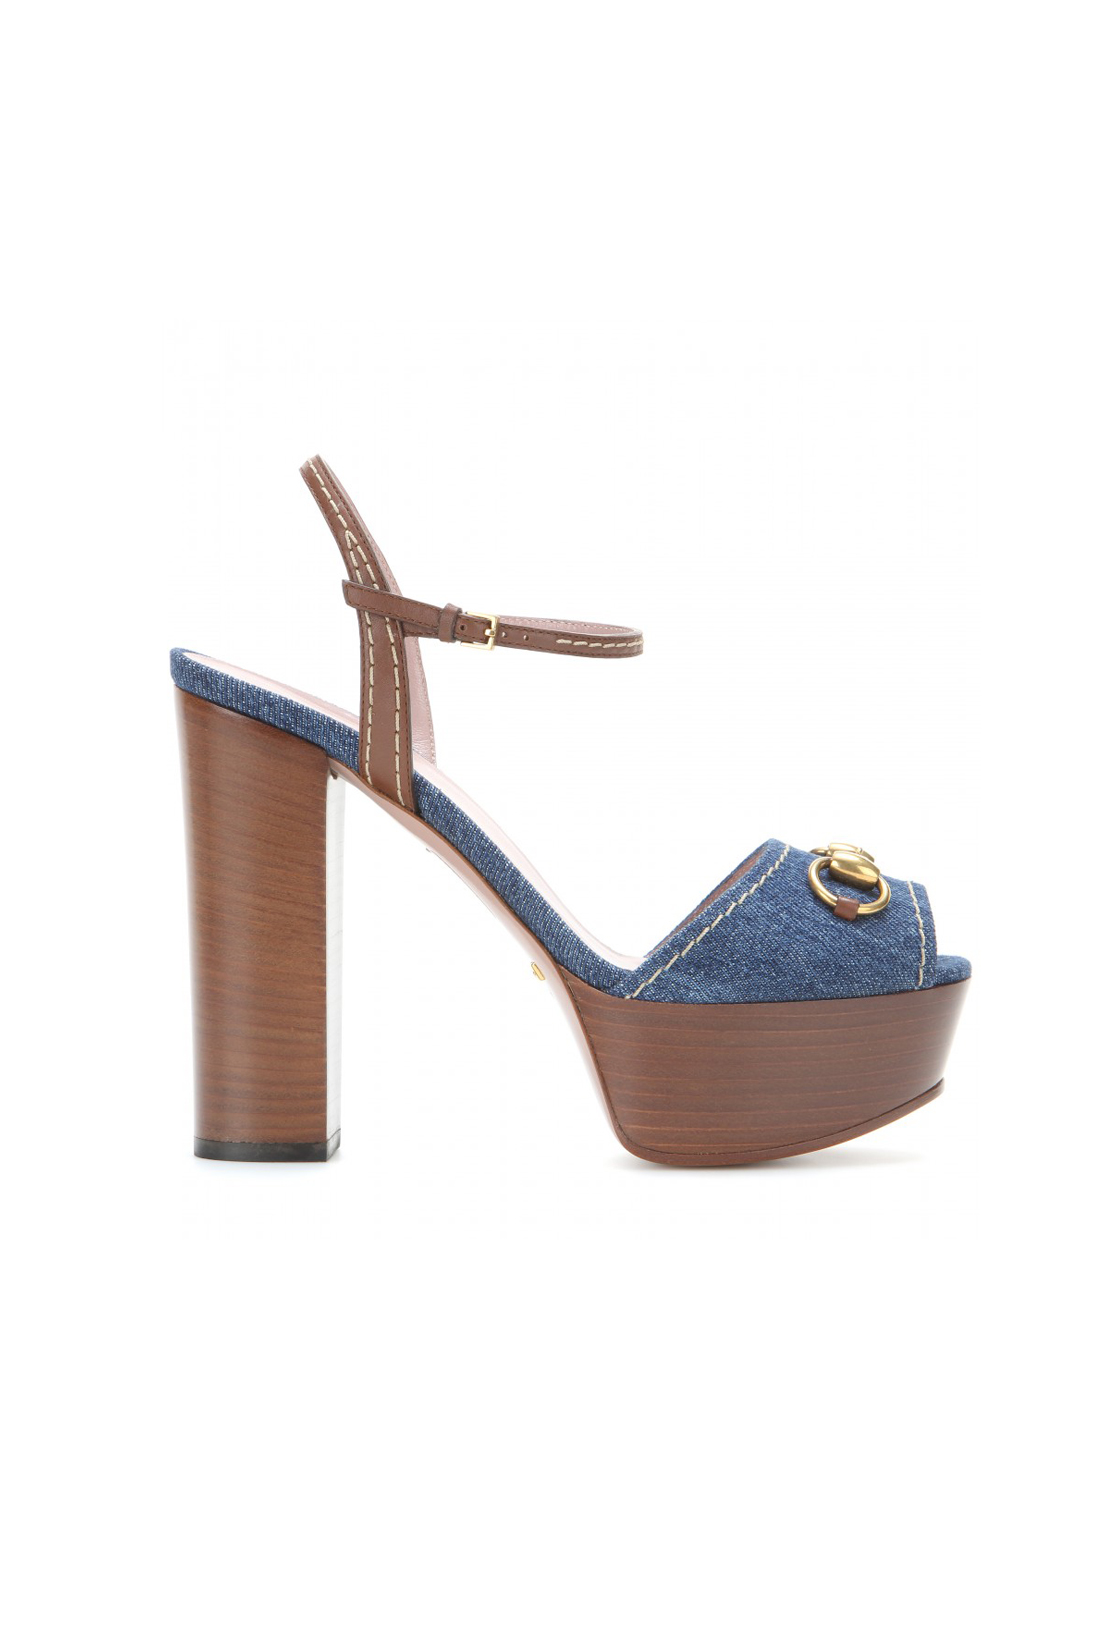 07-spring-denim-trends-shoes-02.jpg